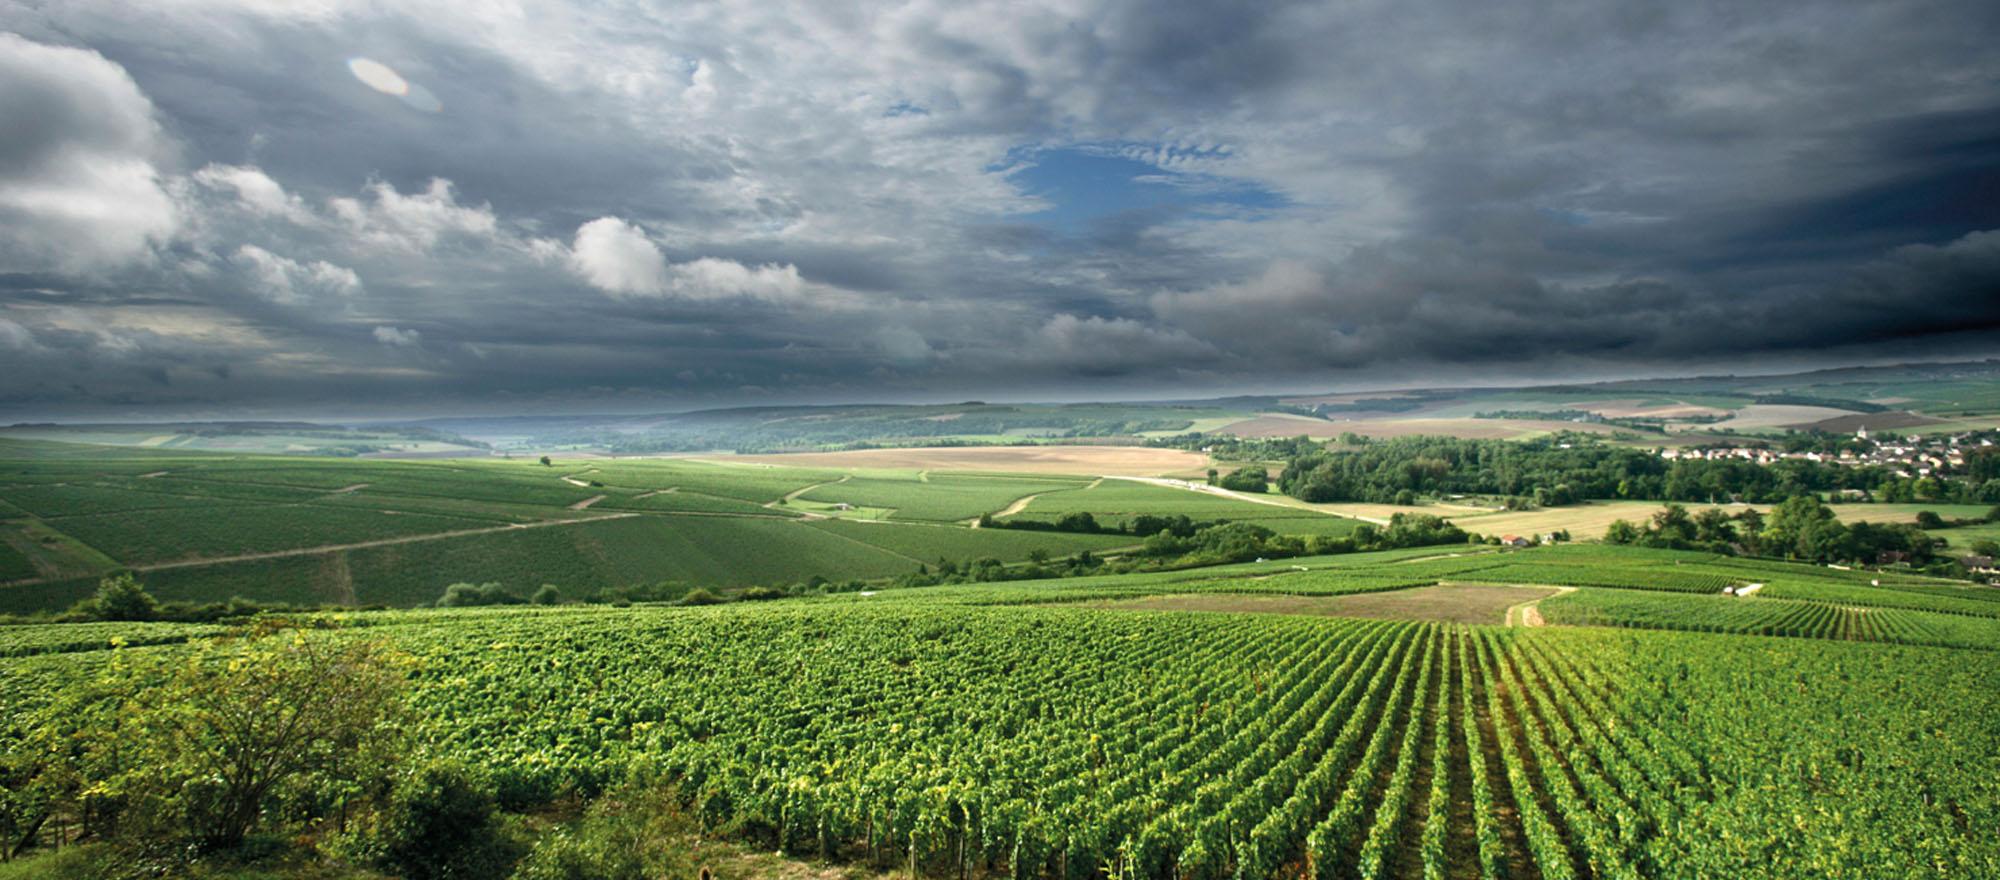 Chablis: si scrive Chablis, si legge Chardonnay